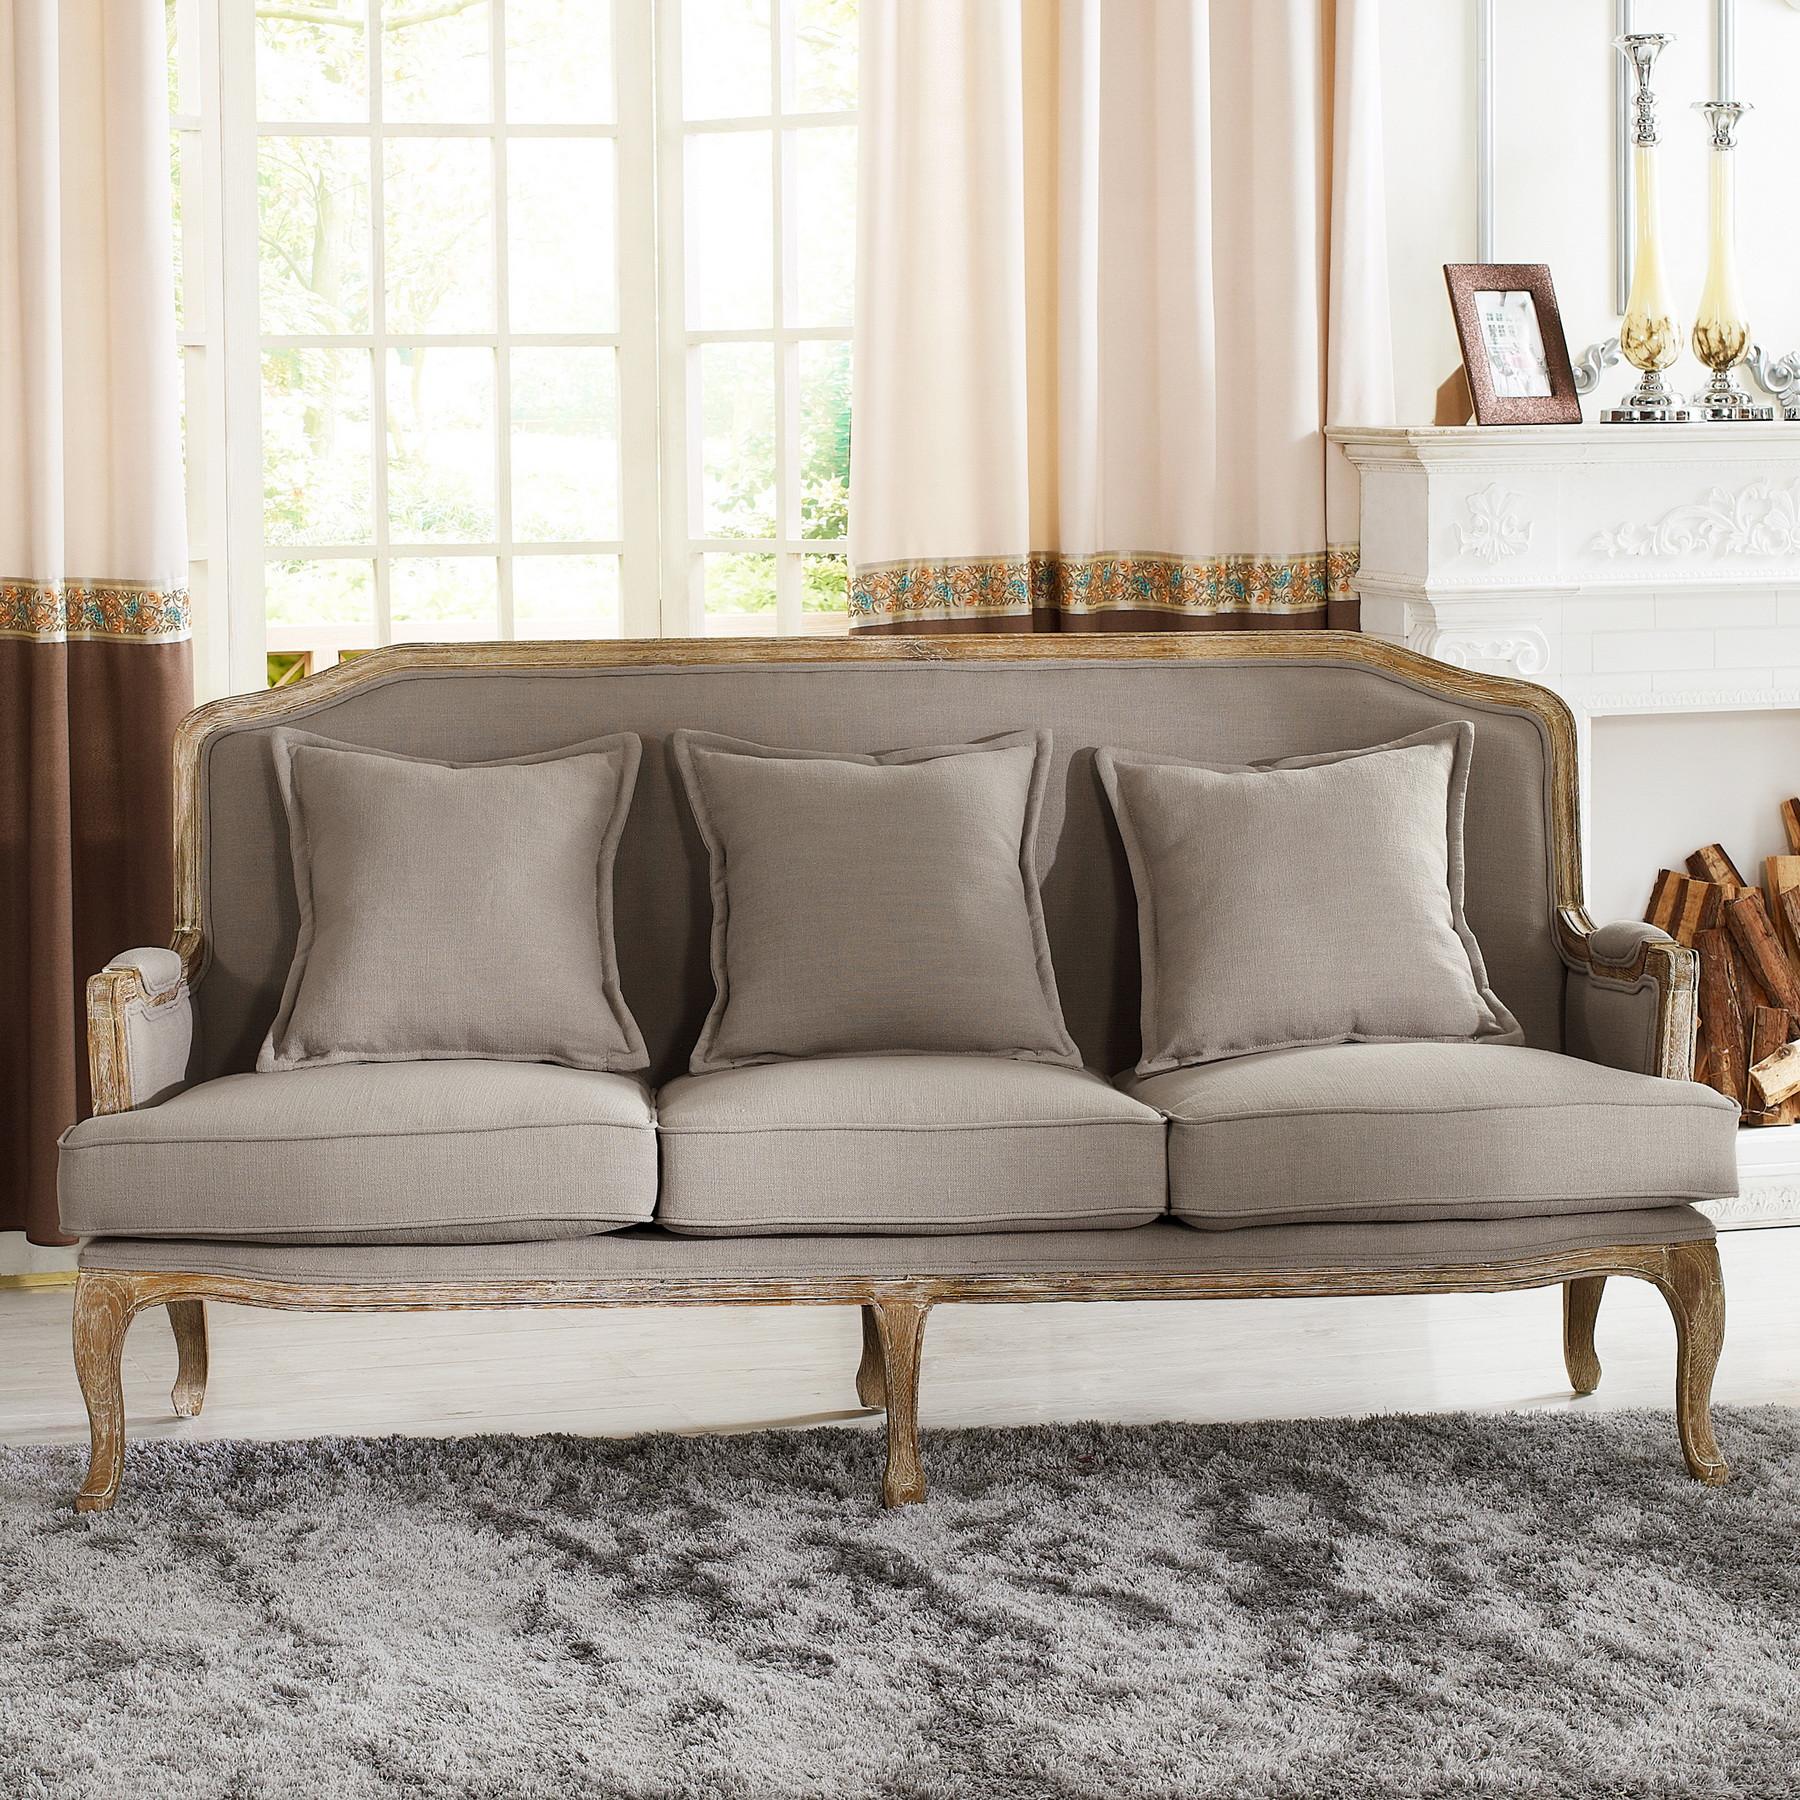 Французский серый диван